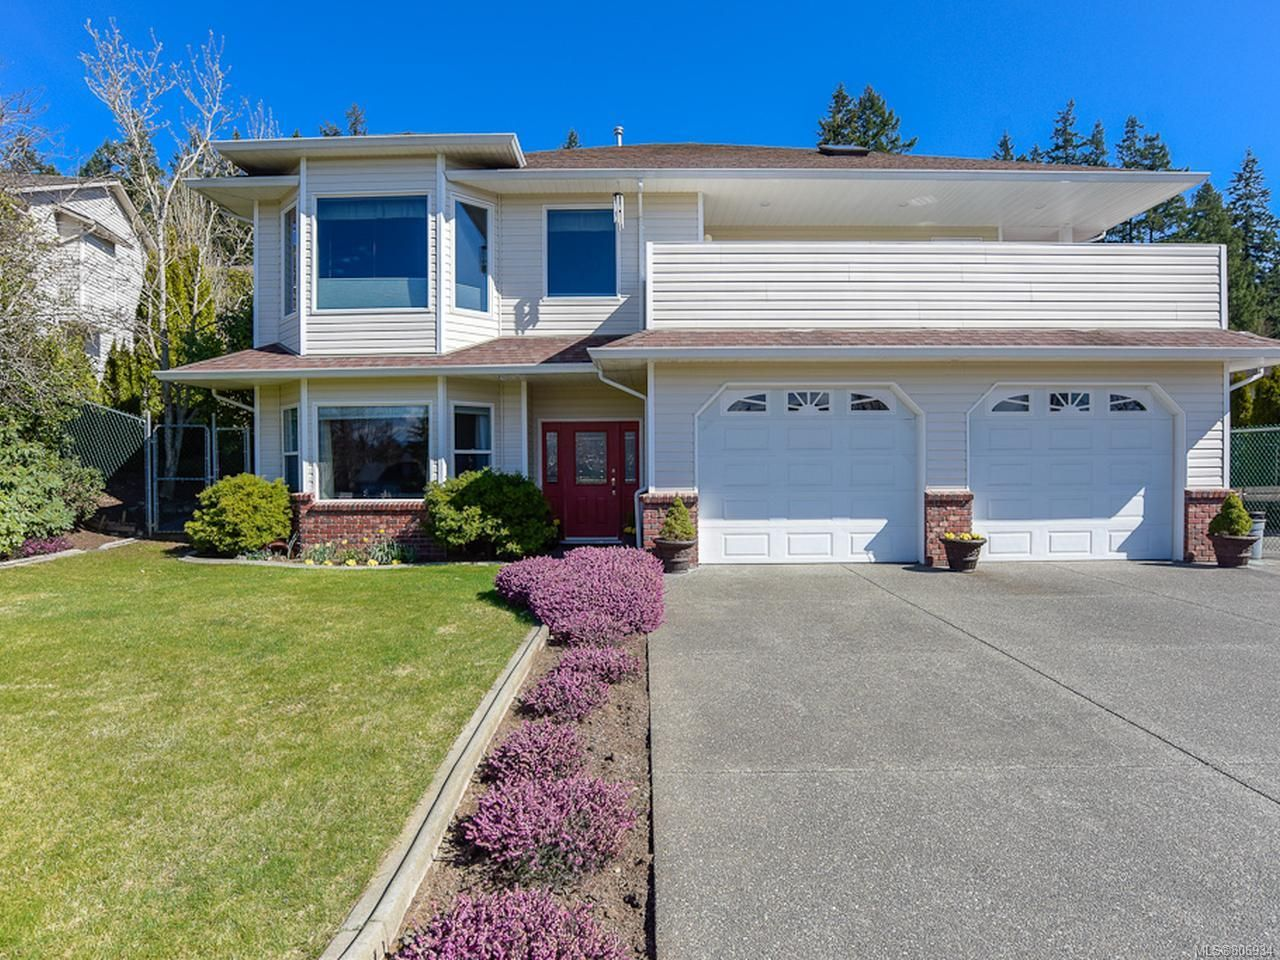 Main Photo: 1417 SABRE Court in COMOX: CV Comox (Town of) House for sale (Comox Valley)  : MLS®# 806934